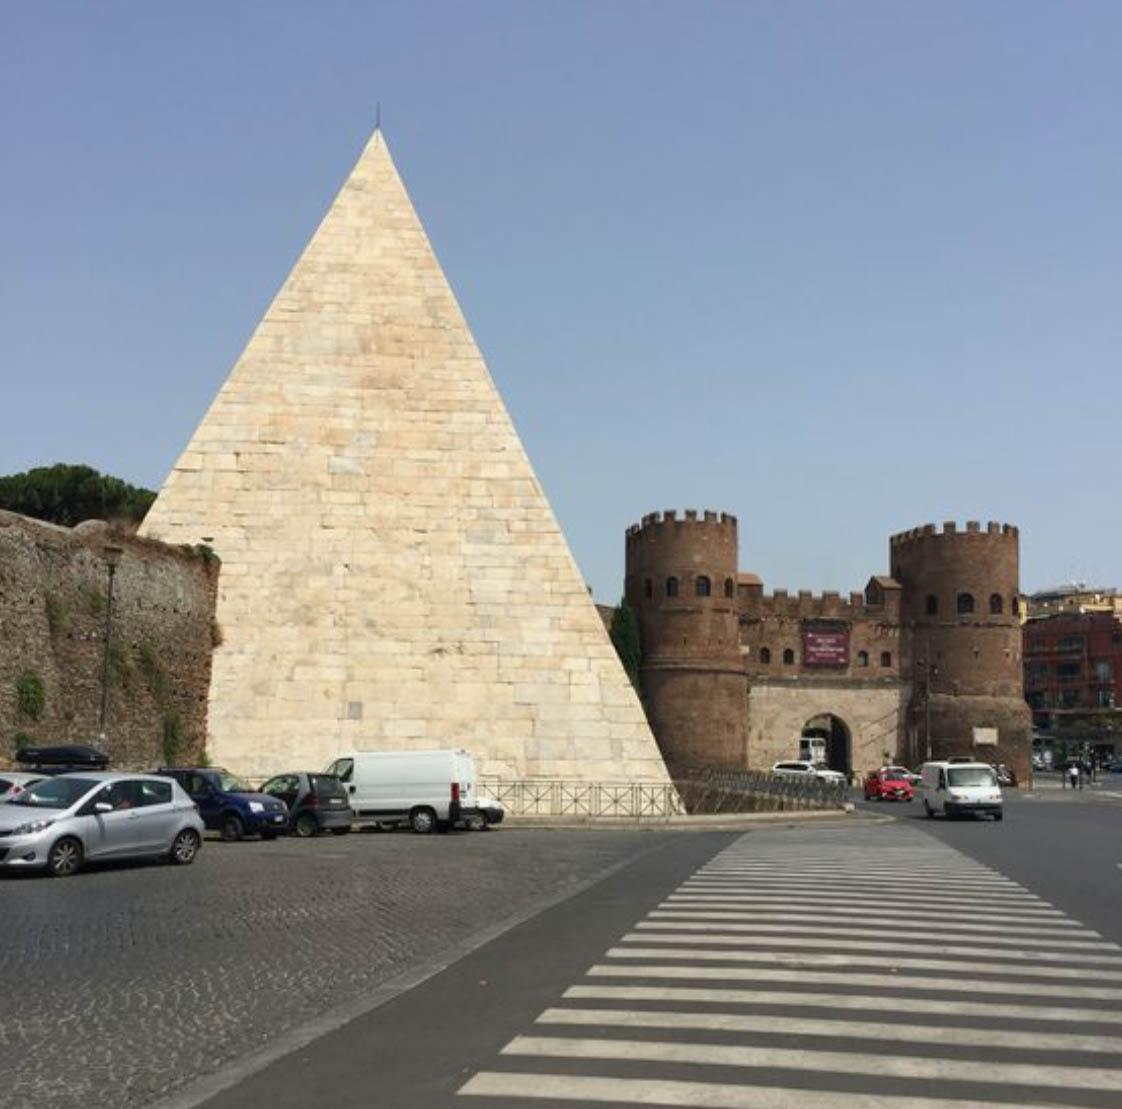 Пирамида Честиа - Piramide Cestia Roma